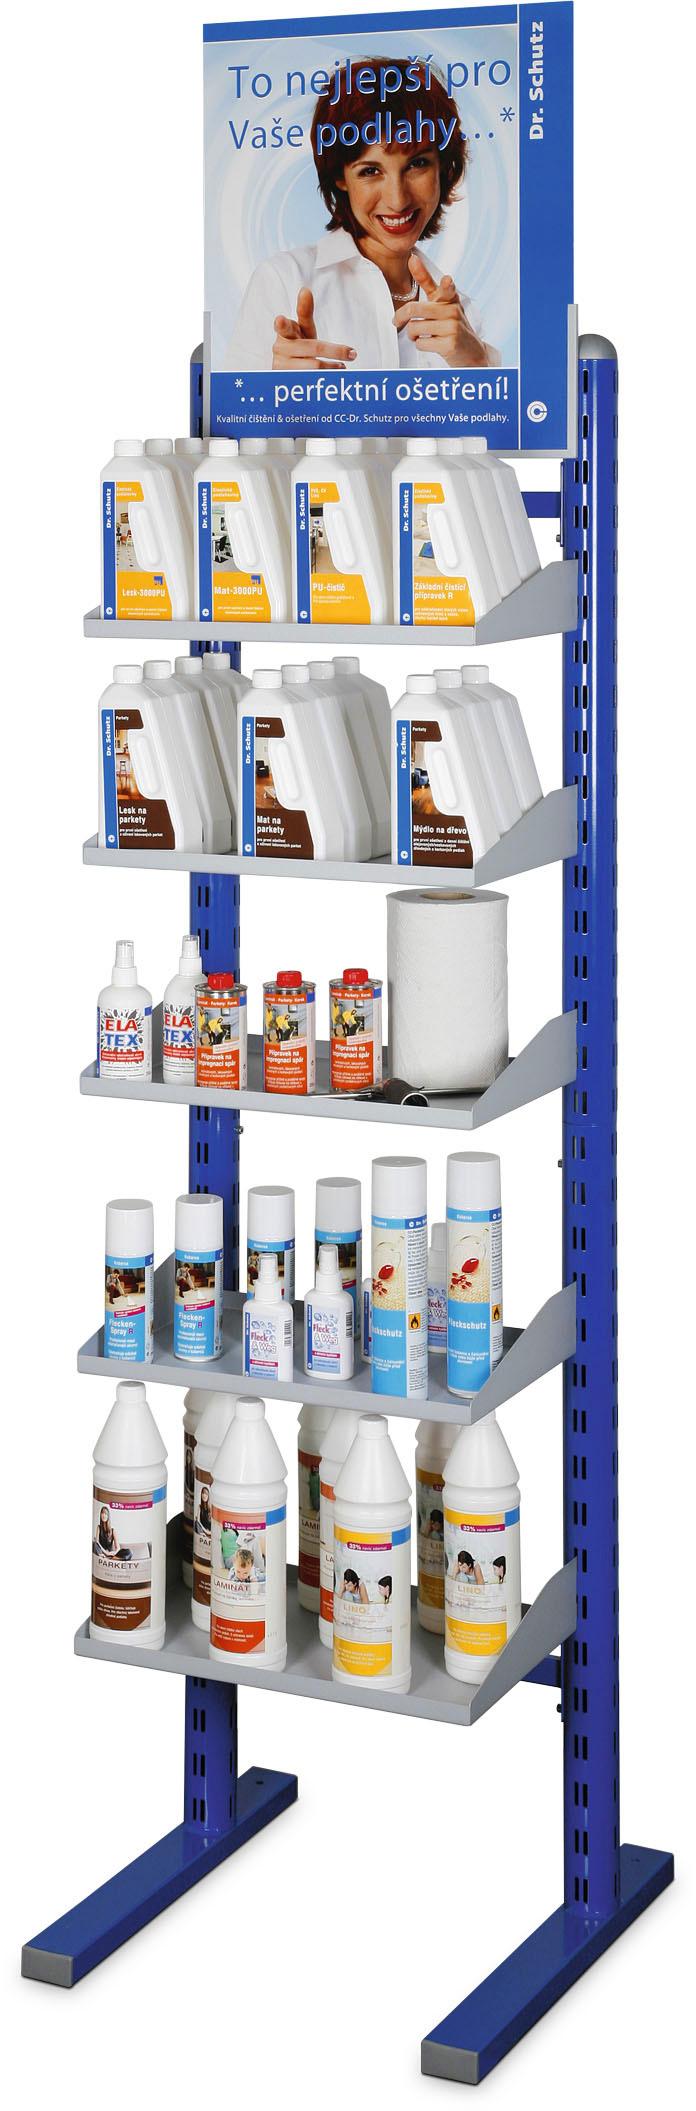 Dr. Schutz - produkty pro péči o vinyl, linoleum i kaučuk